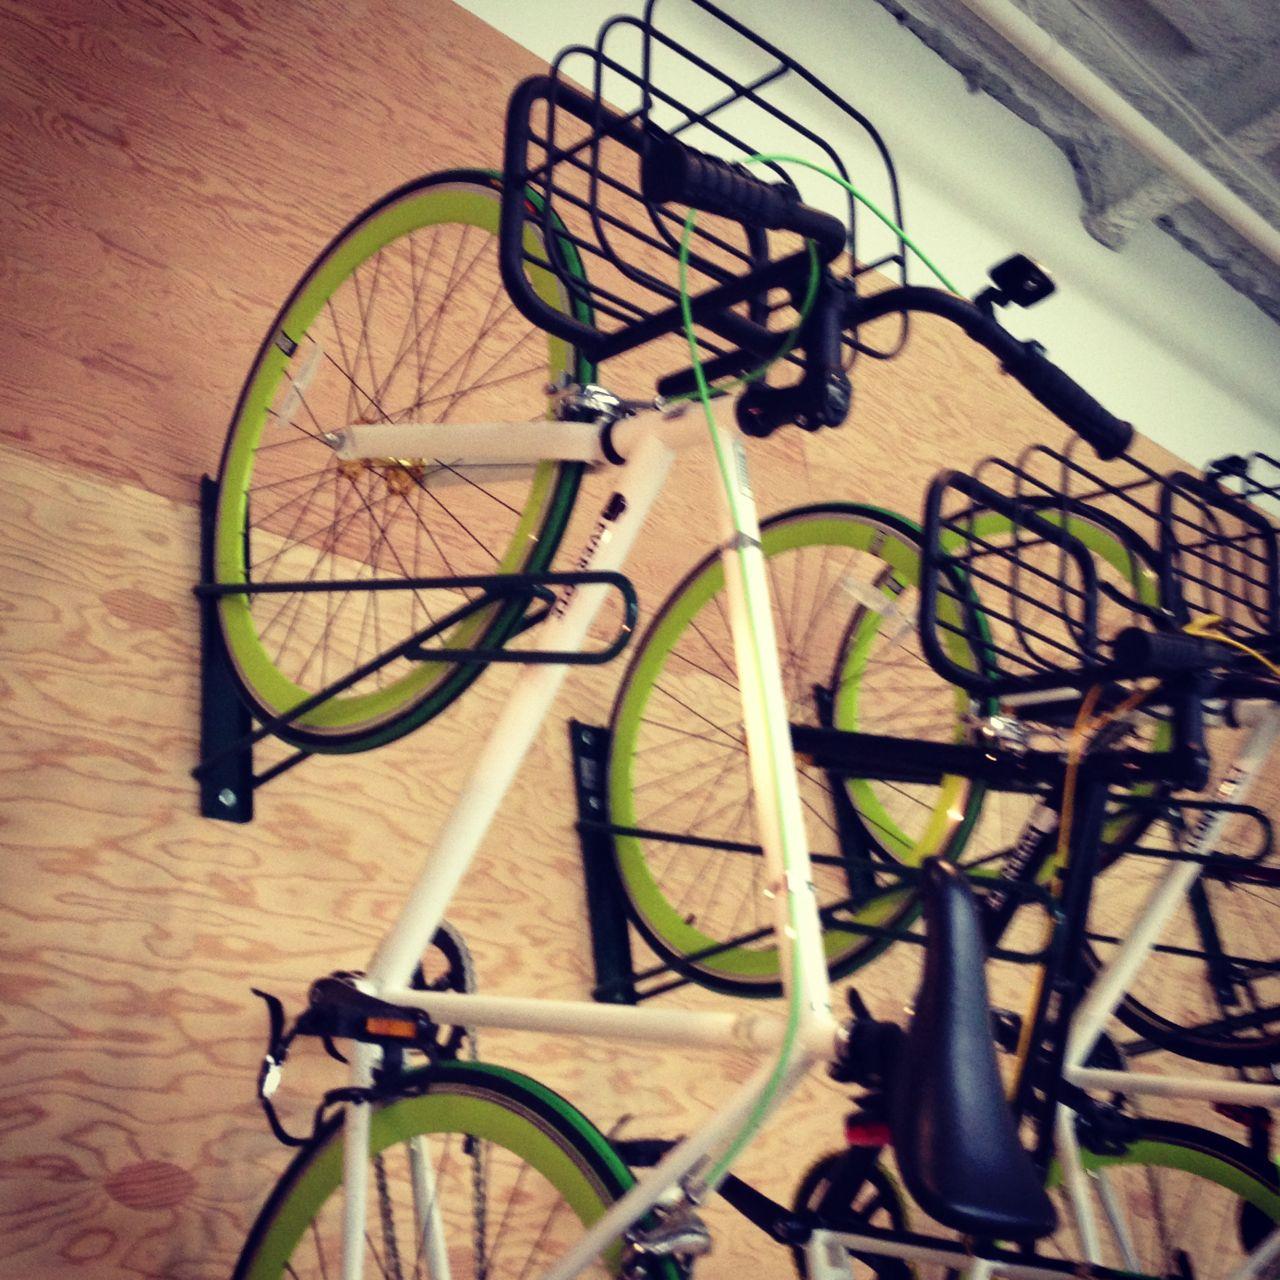 Evernote_Bikes